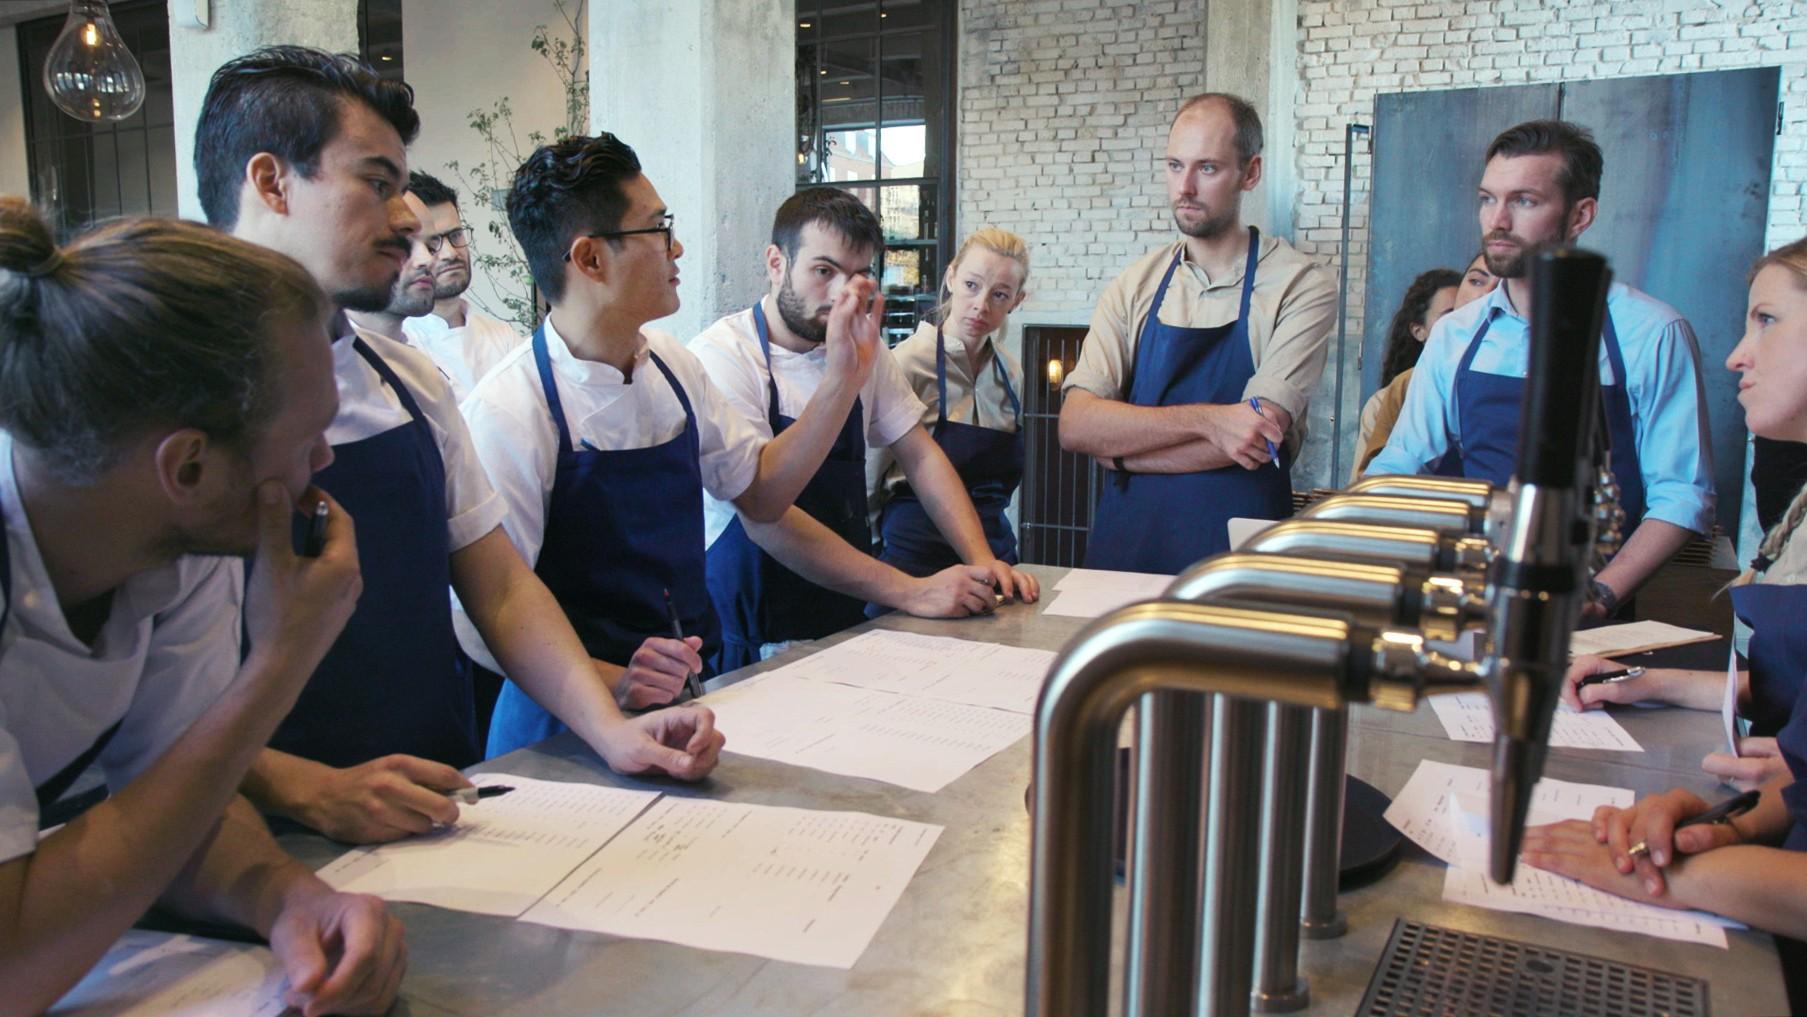 MUNCHIES præsenterer: En dag på restaurant 108